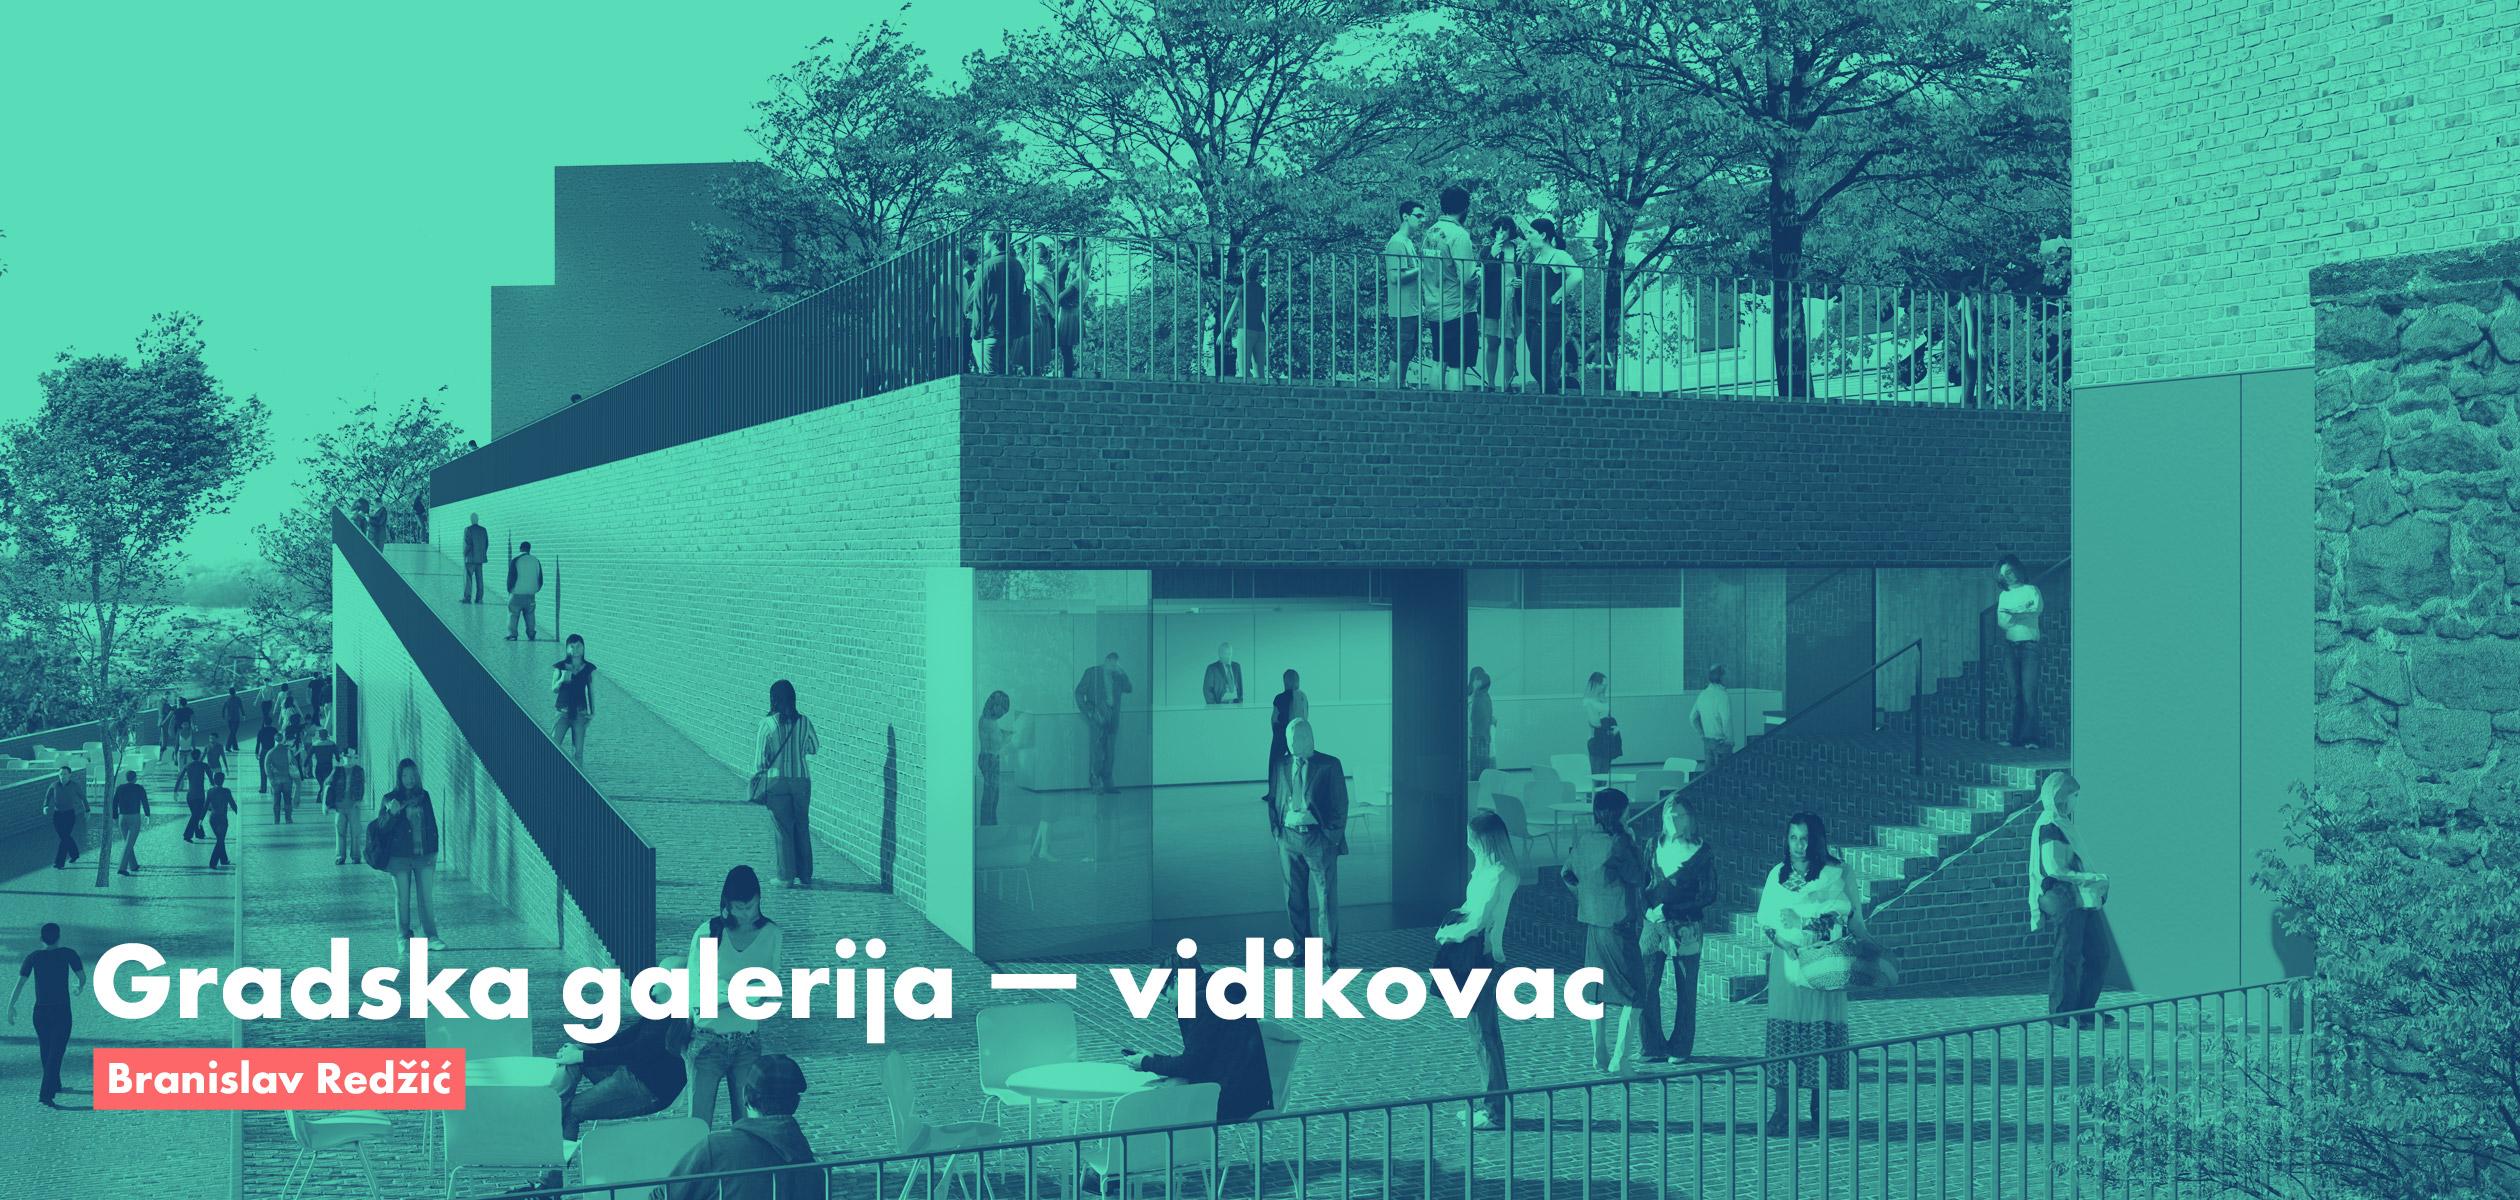 gradska-galerija-vidikovac.jpg